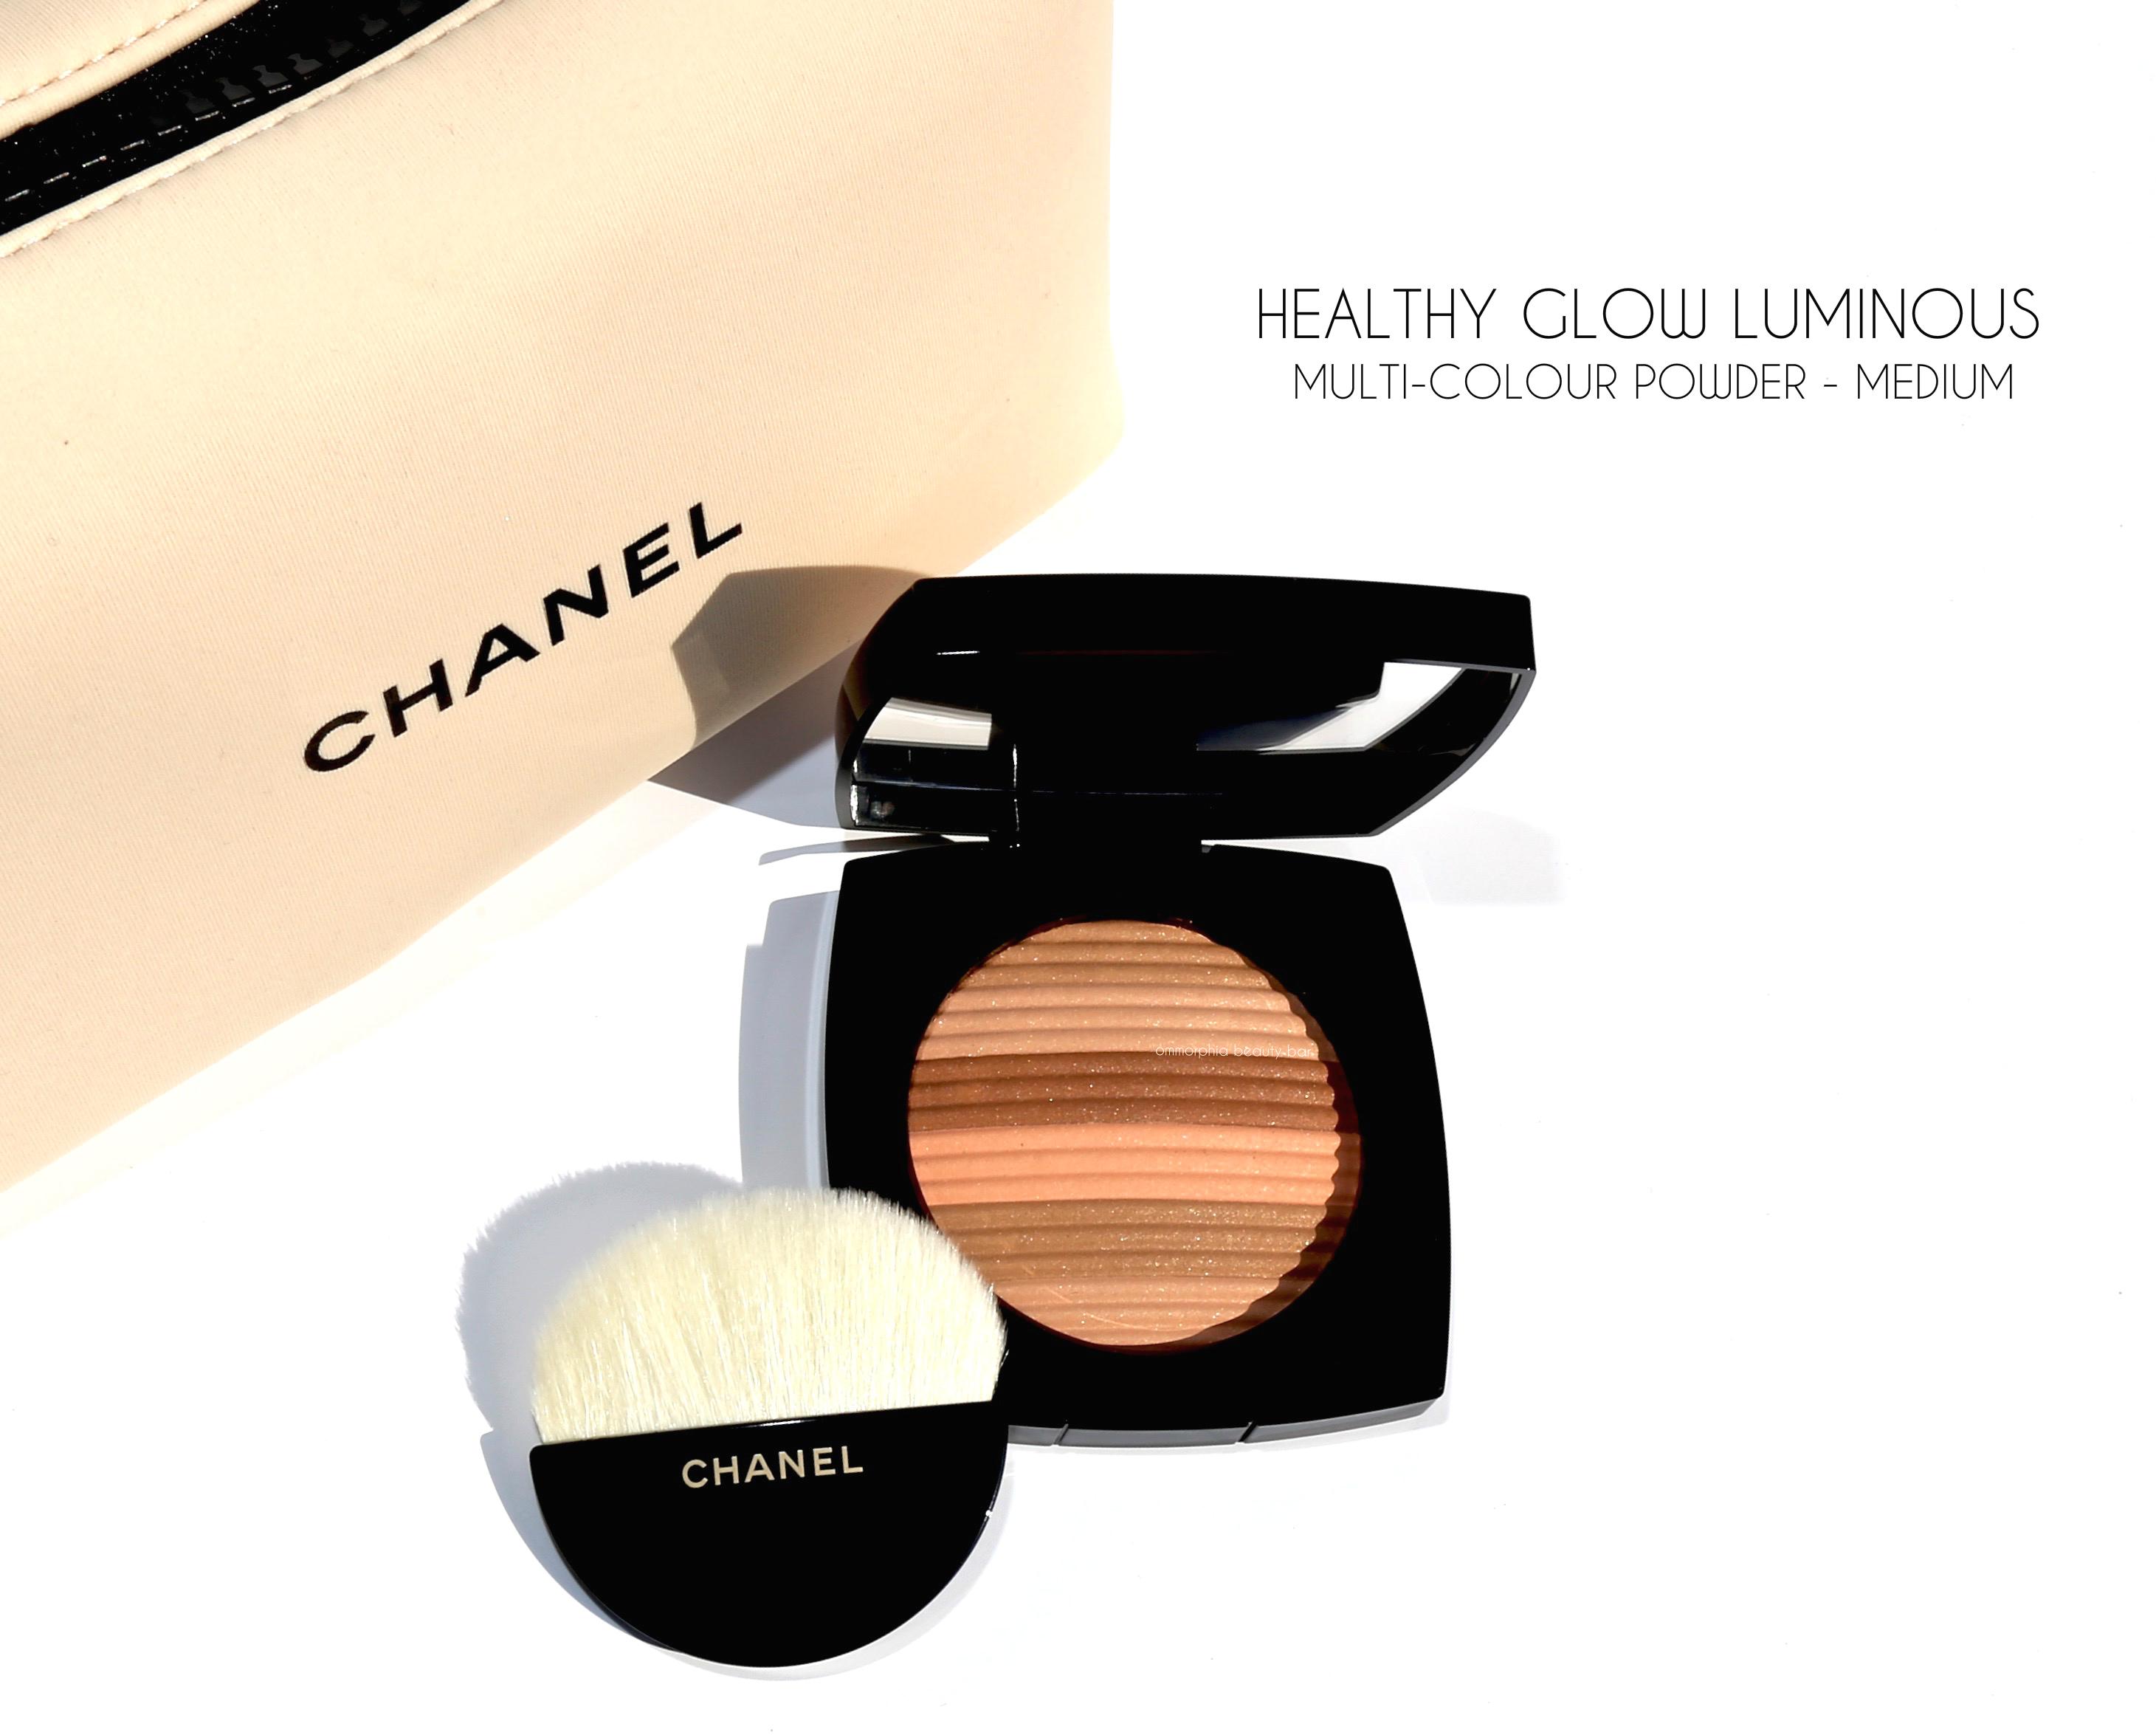 de42fe0cc85 Healthy Glow Luminous Multi-Colour Powder in Medium